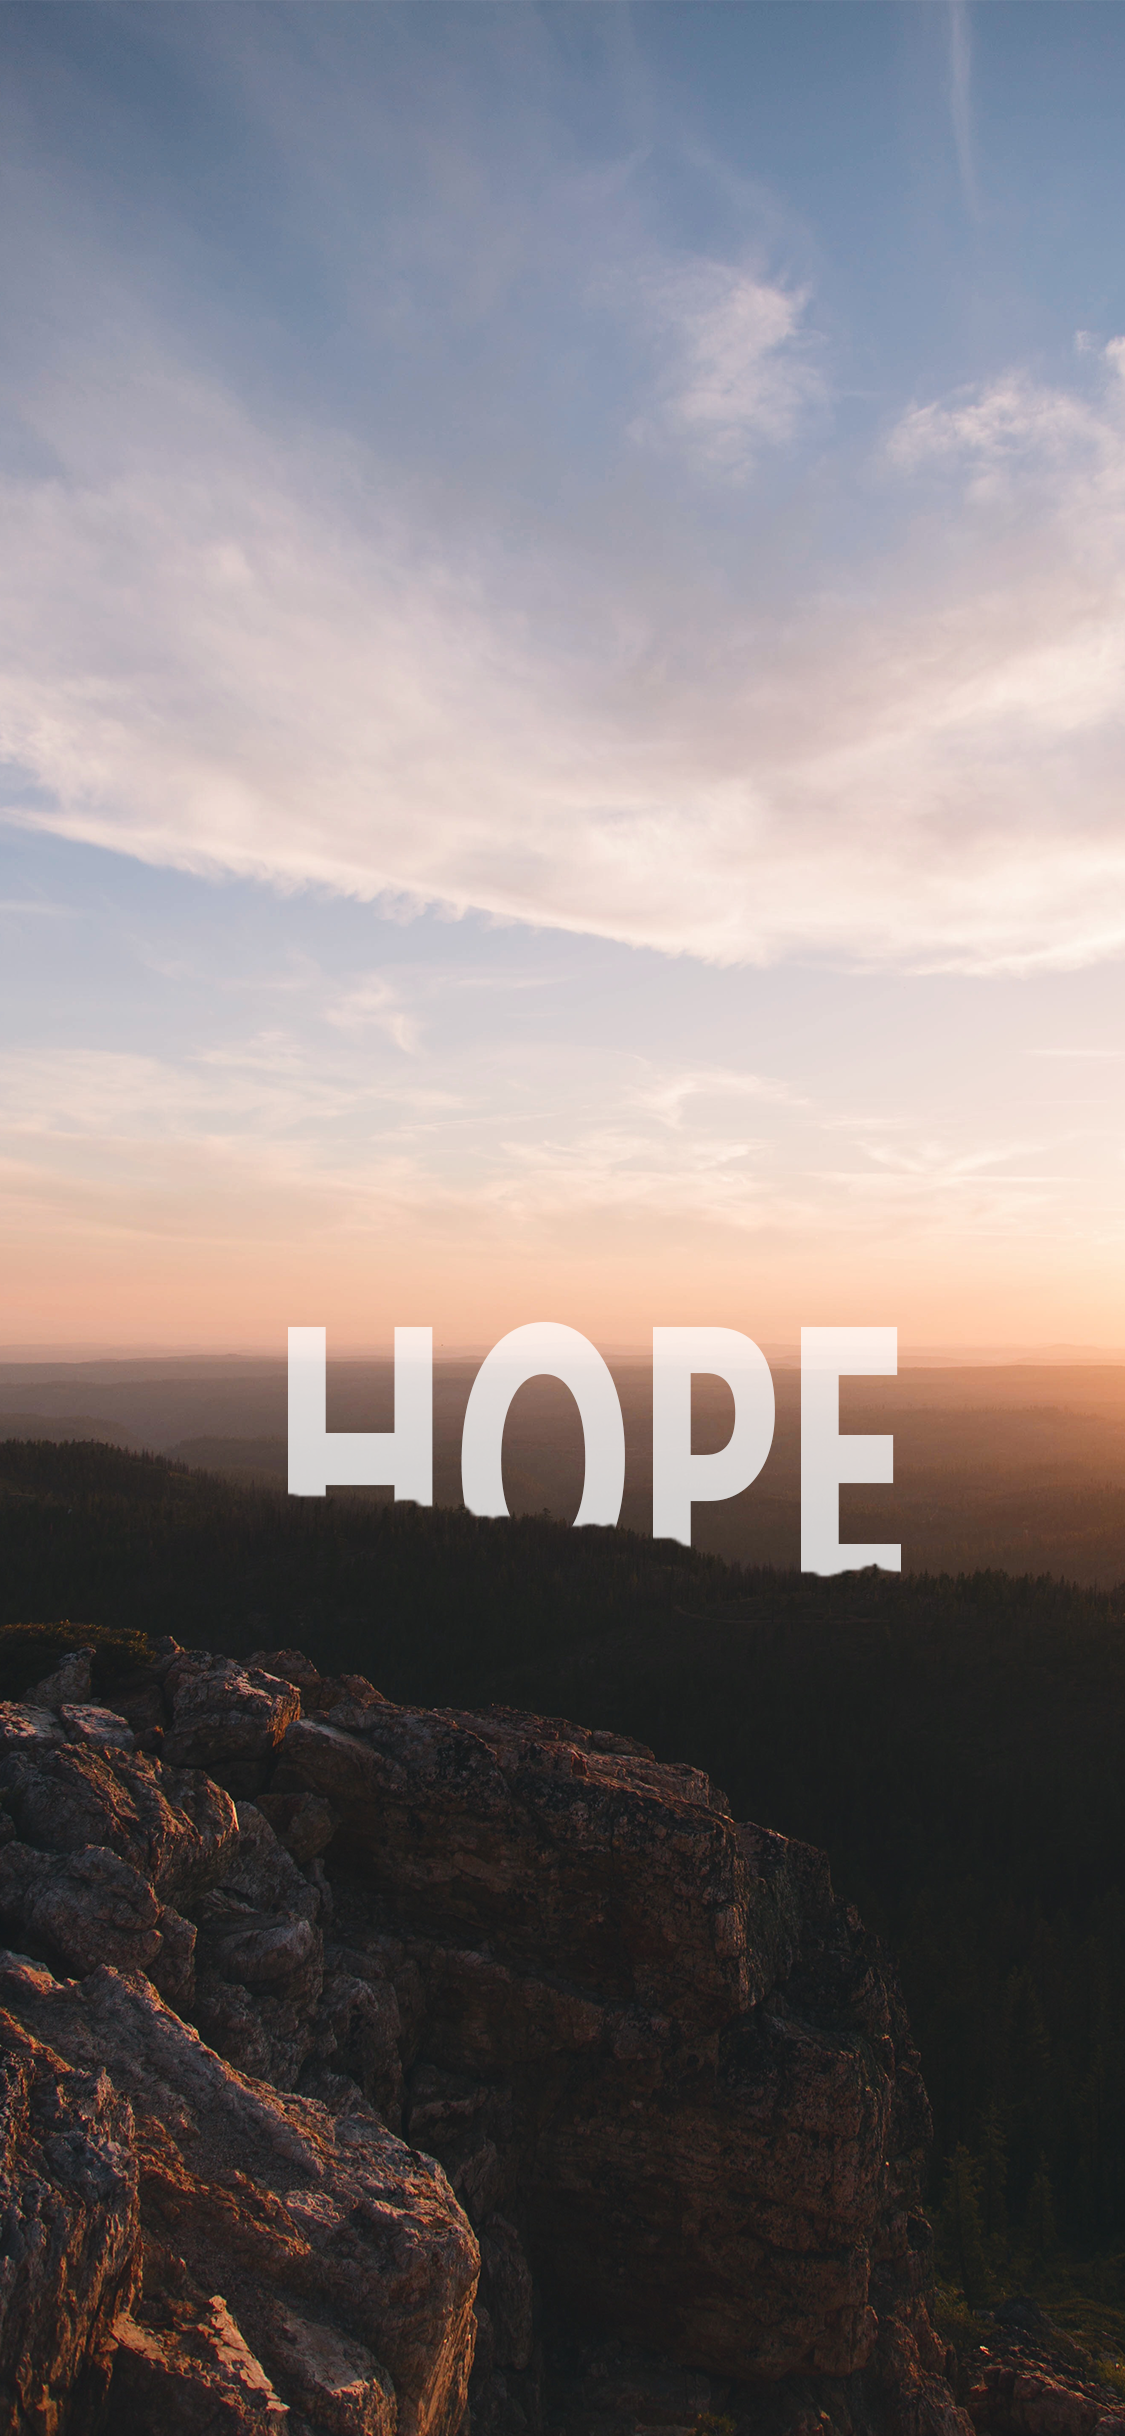 hope wallpapers